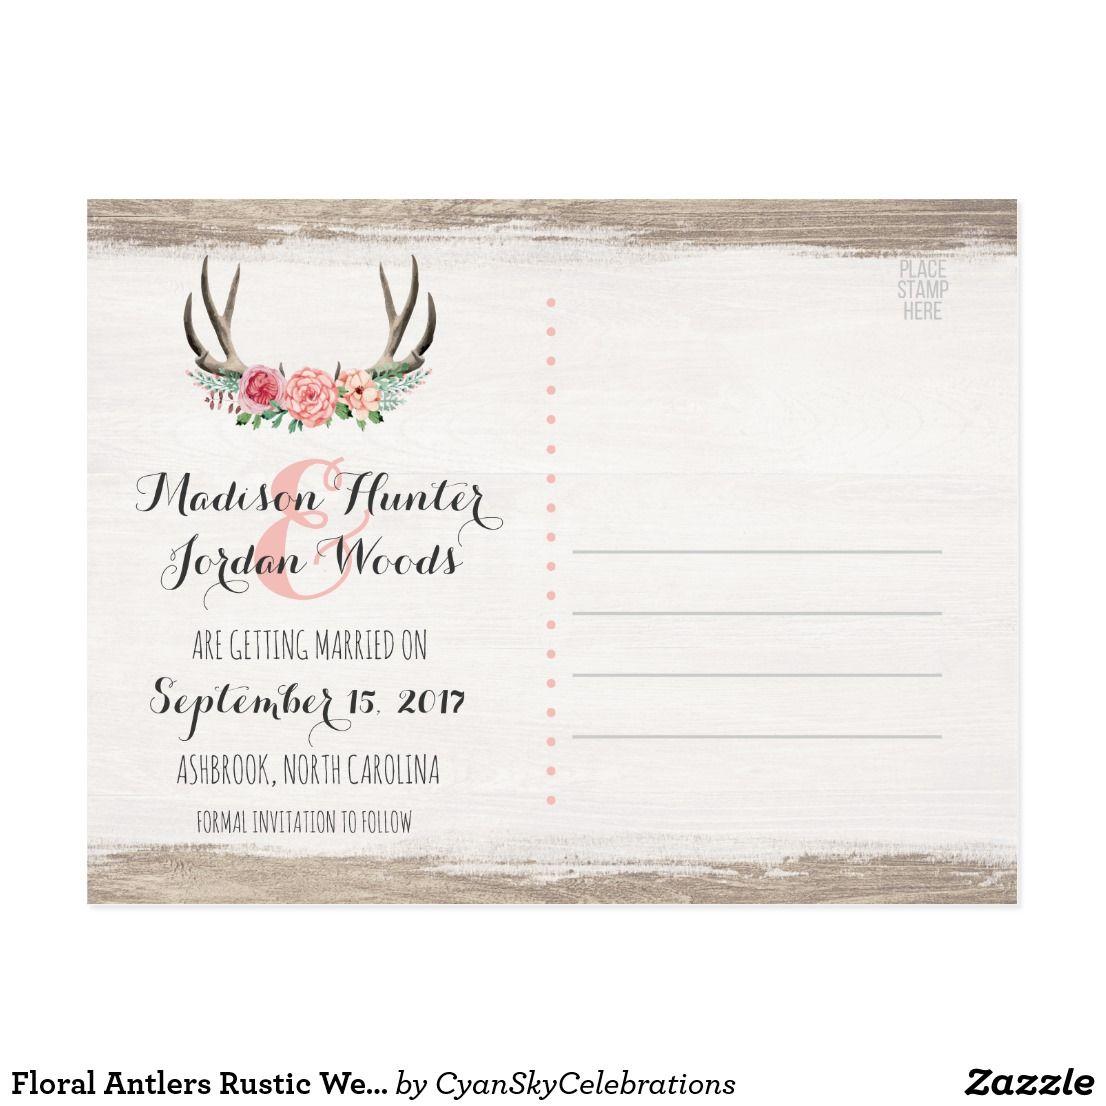 Floral Antlers Rustic Wedding   Save The Date Postcard   Wedding ...